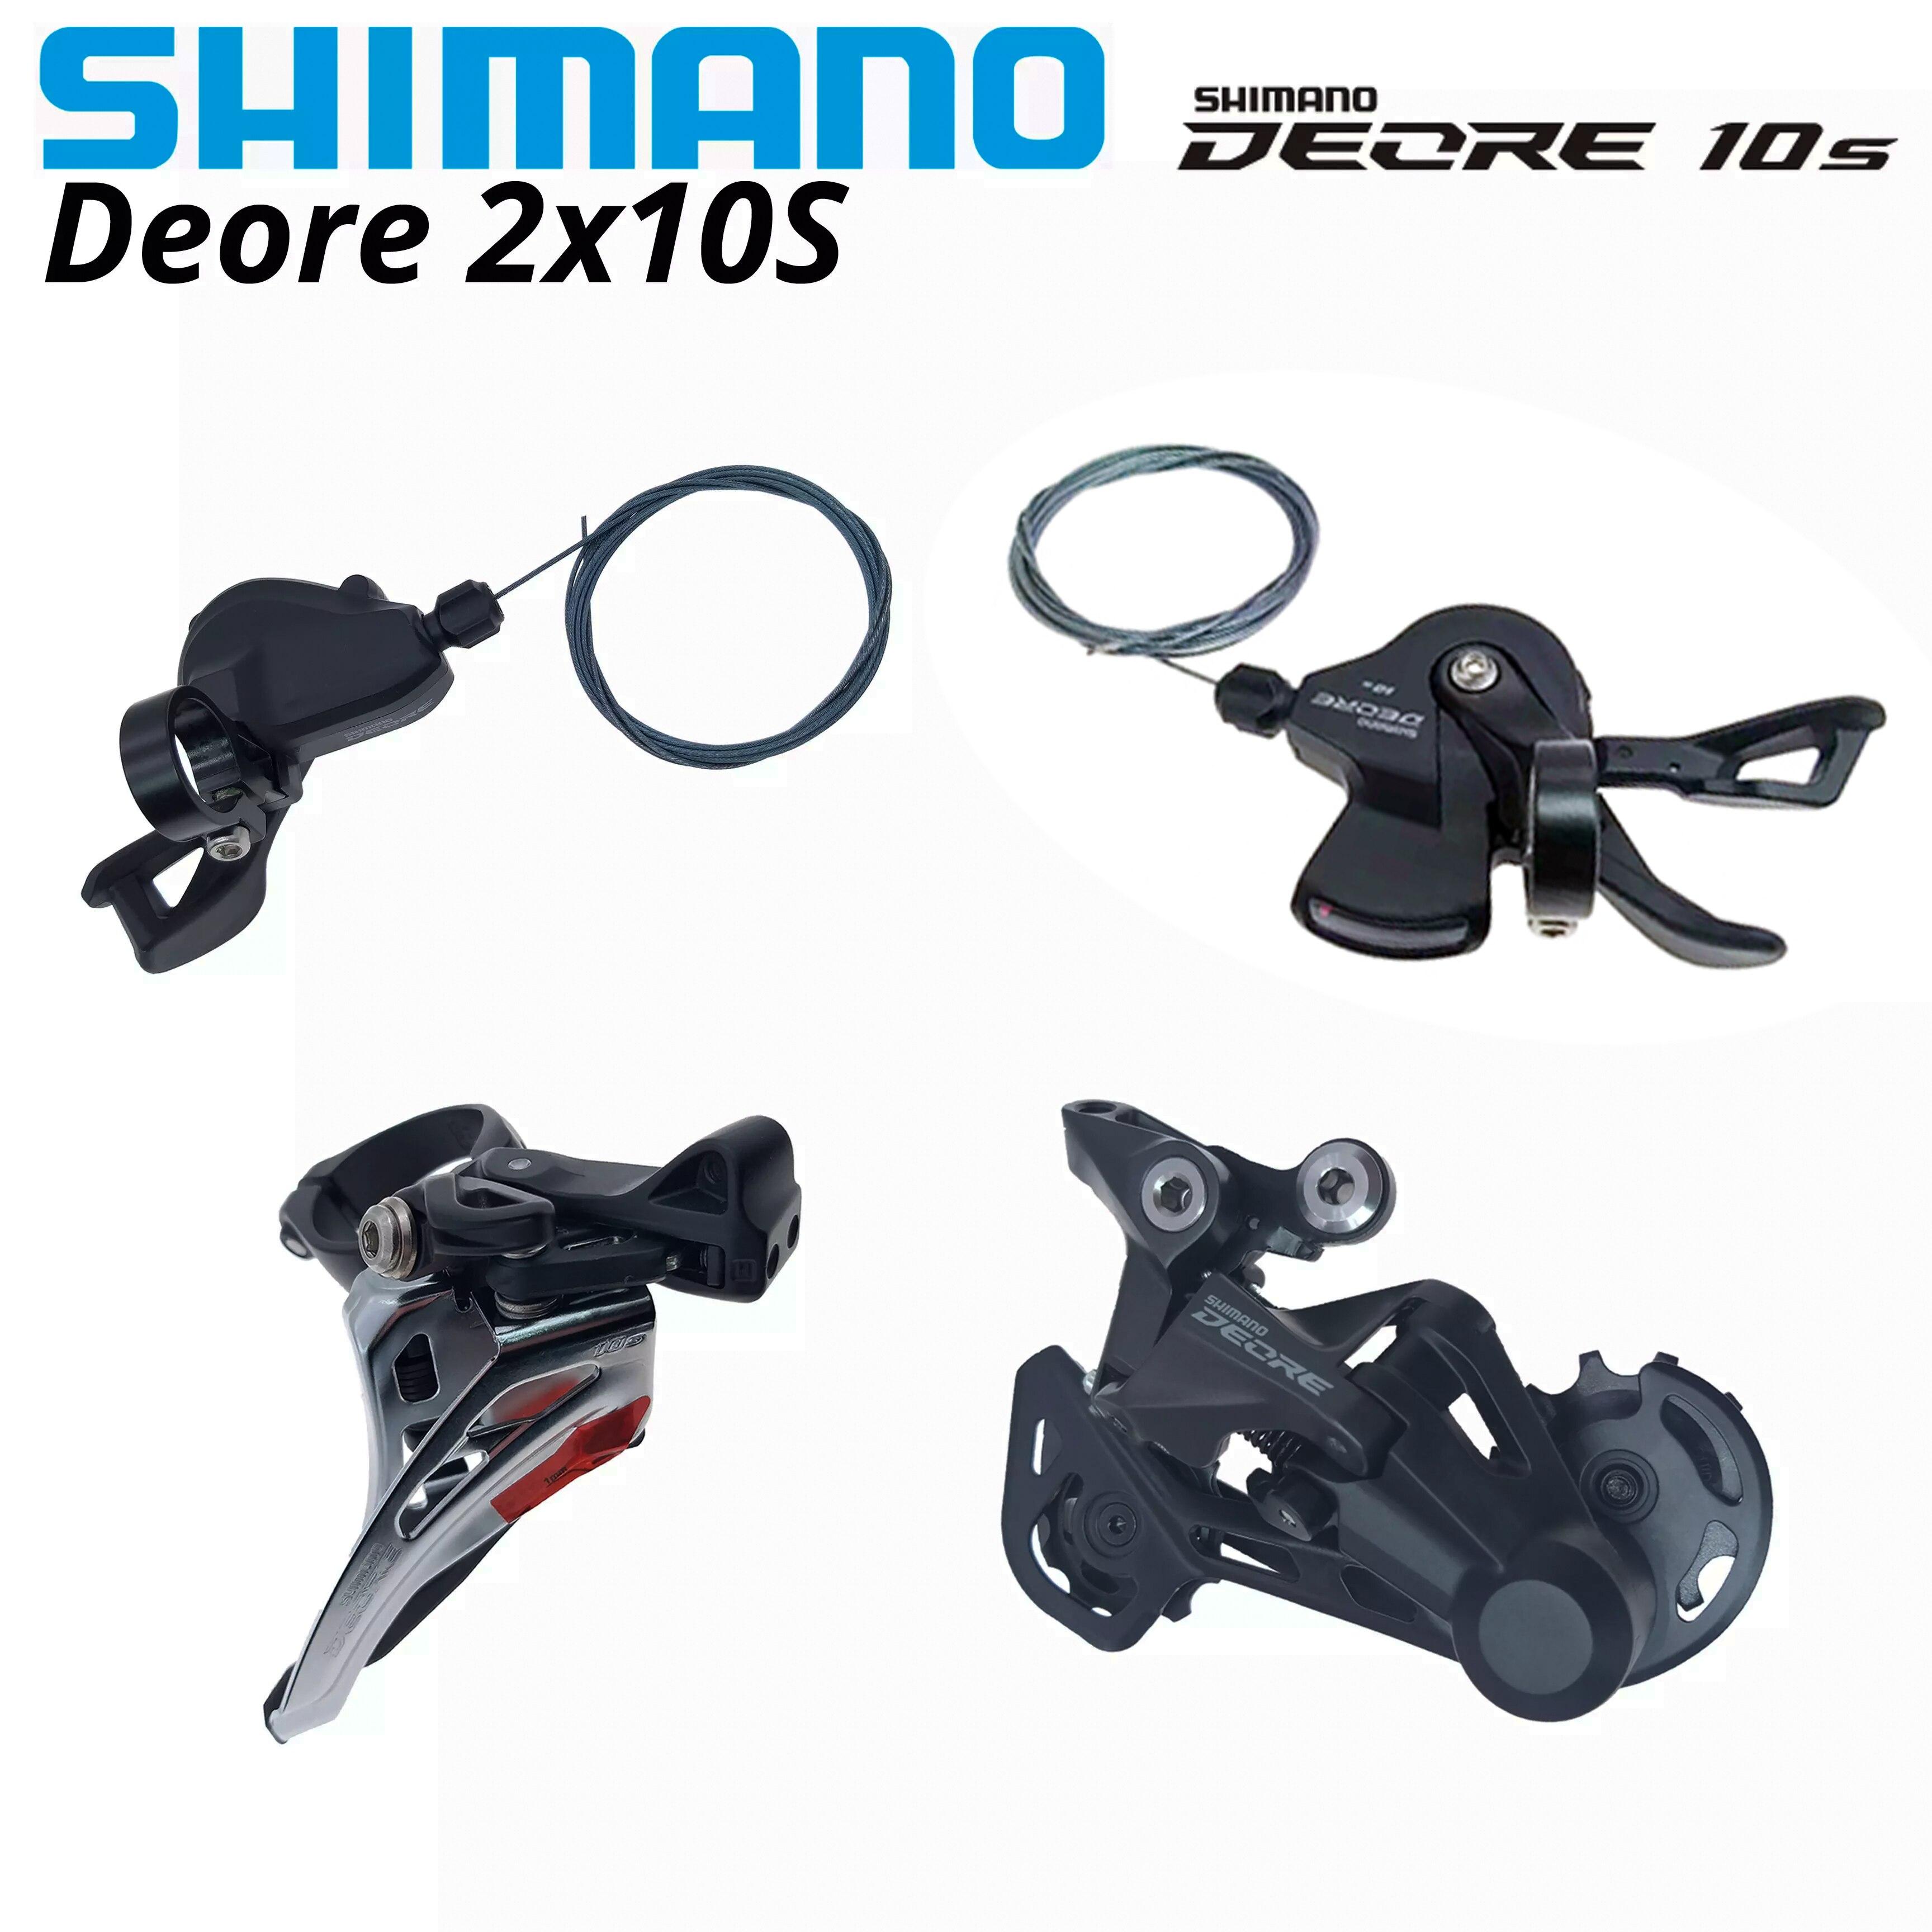 Shimano DEORE M4100 M5100 2x10s 20 Grupo SL palanca derecha izquierda par 10v RD M4120 SGS desviador trasero FD M4100 frente cambio|Desviador de bicicleta| - AliExpress